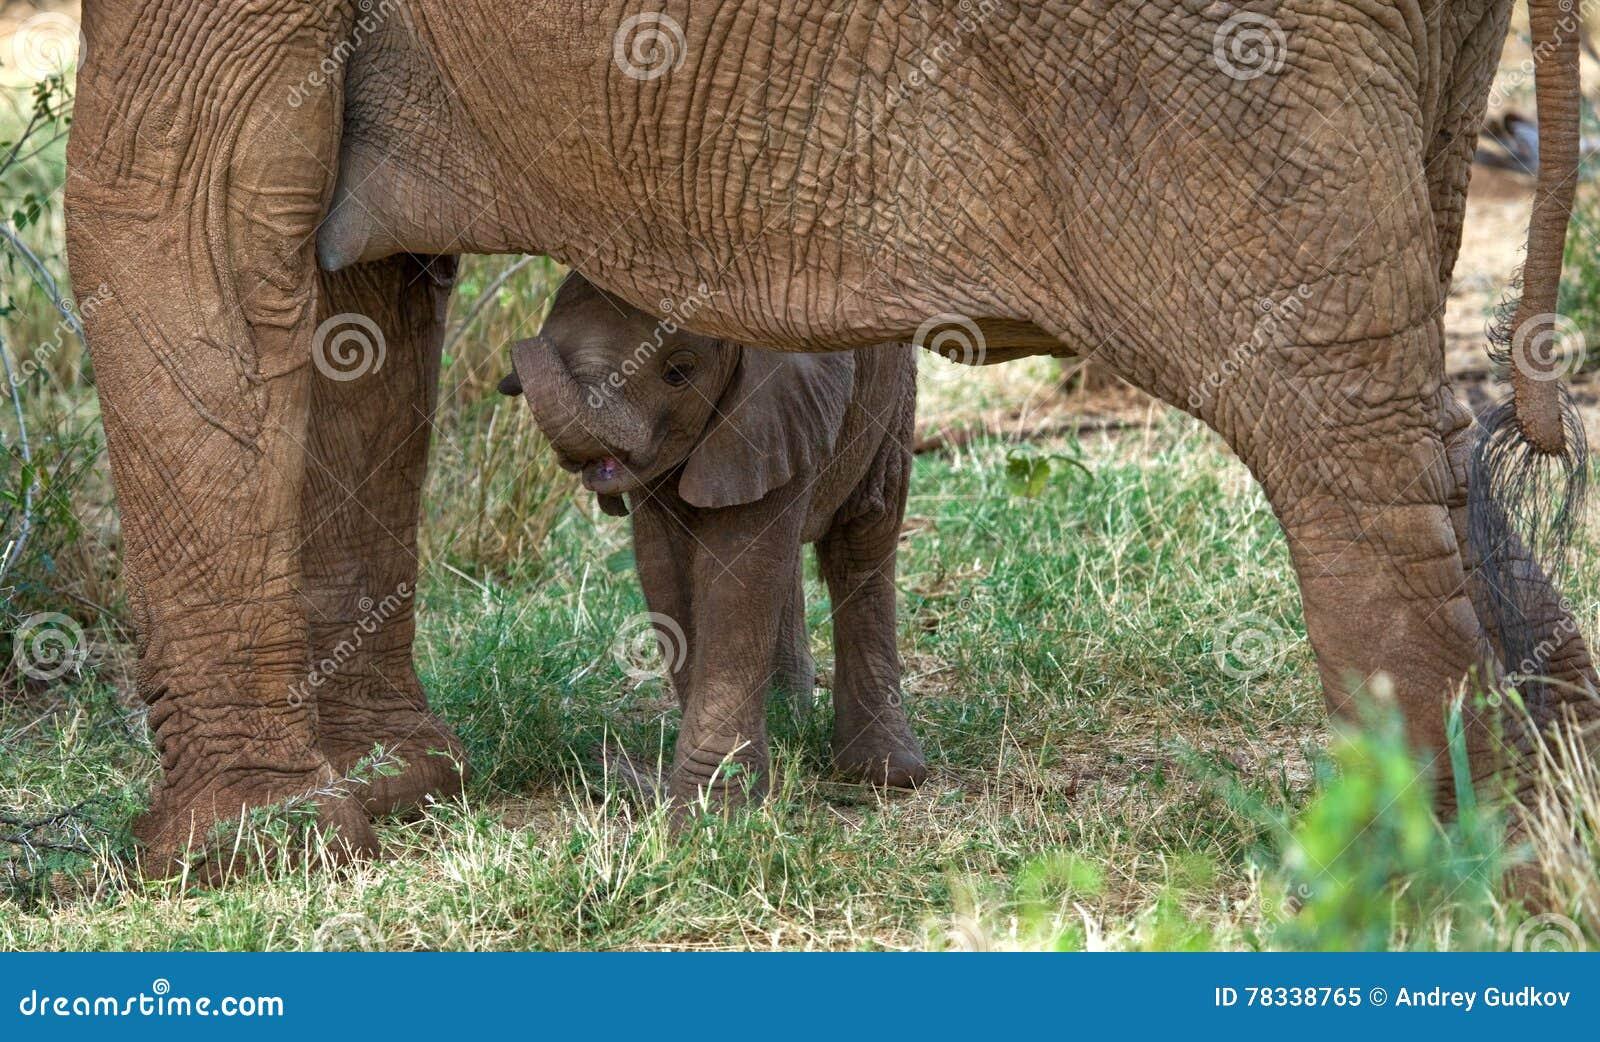 Baby elephant is close to his mother. Africa. Kenya. Tanzania. Serengeti. Maasai Mara.